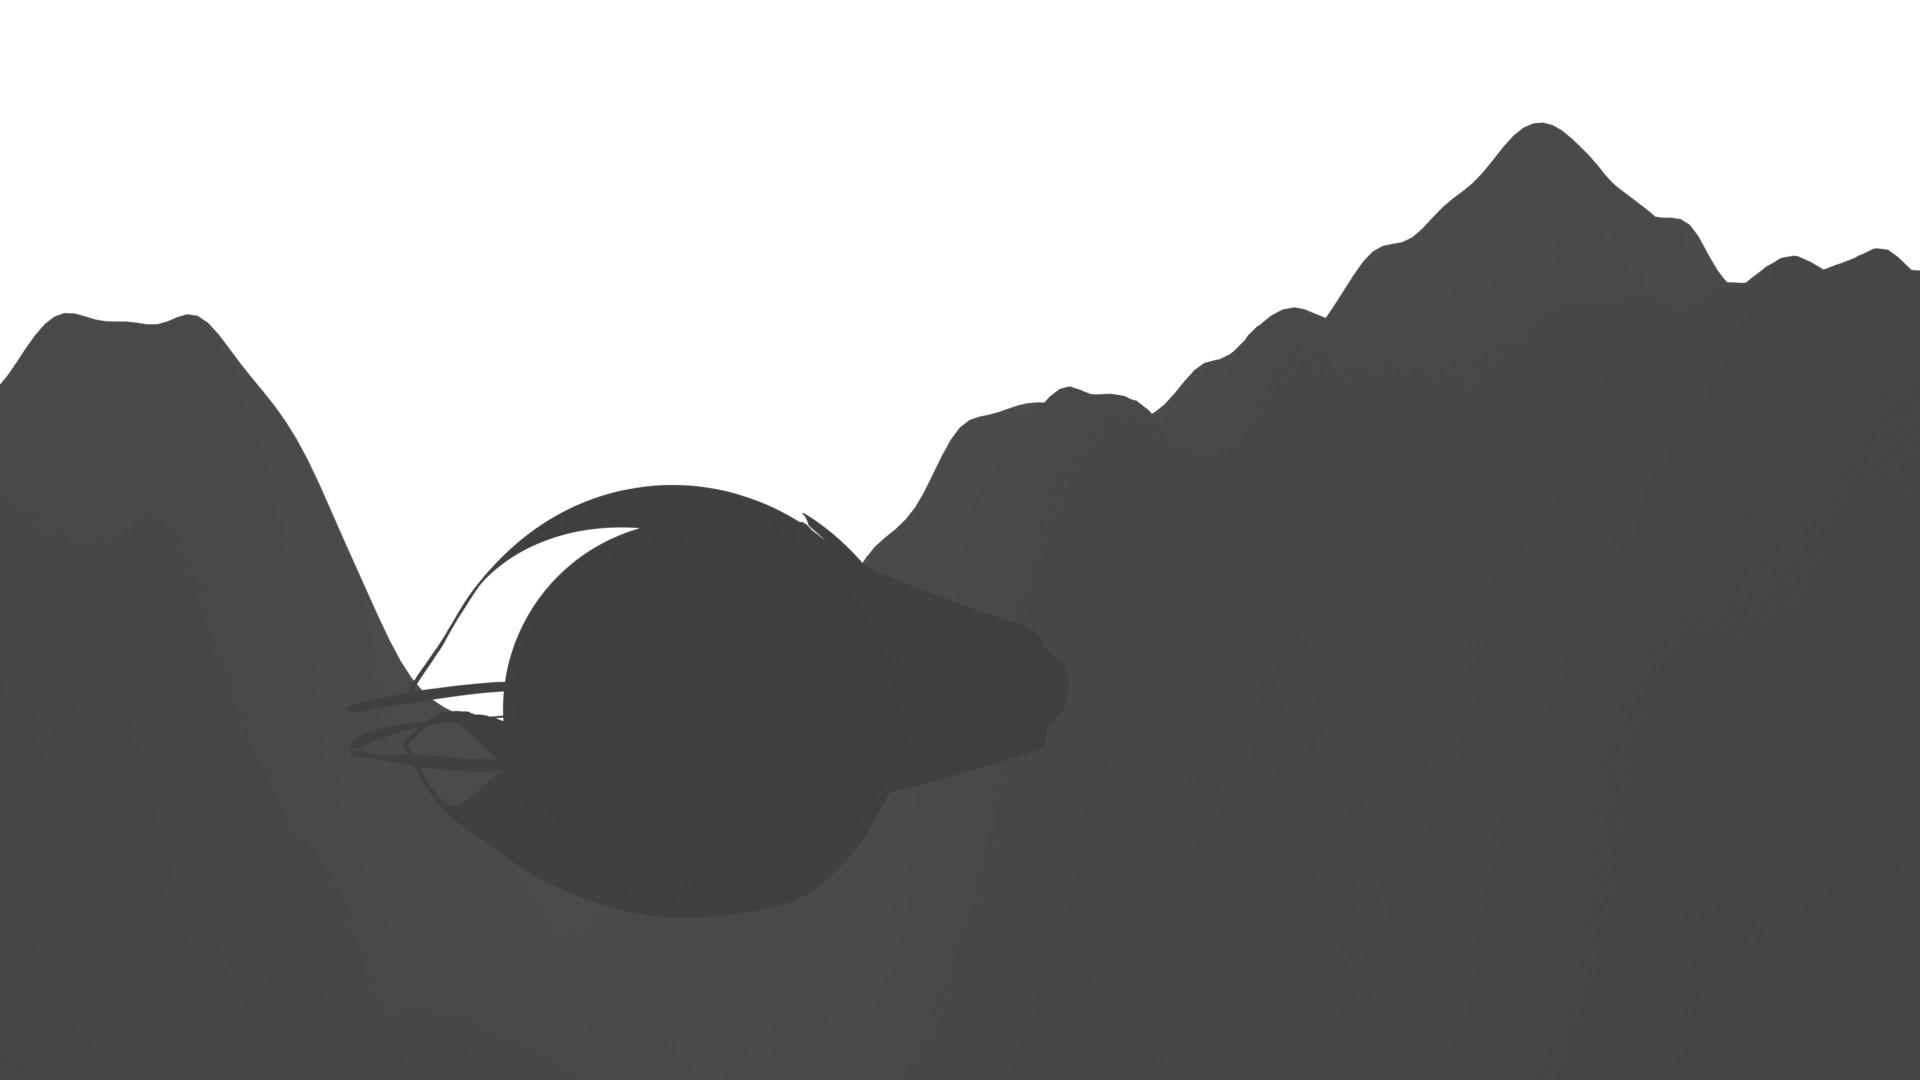 Kresimir jelusic robob3ar 259 280616 z